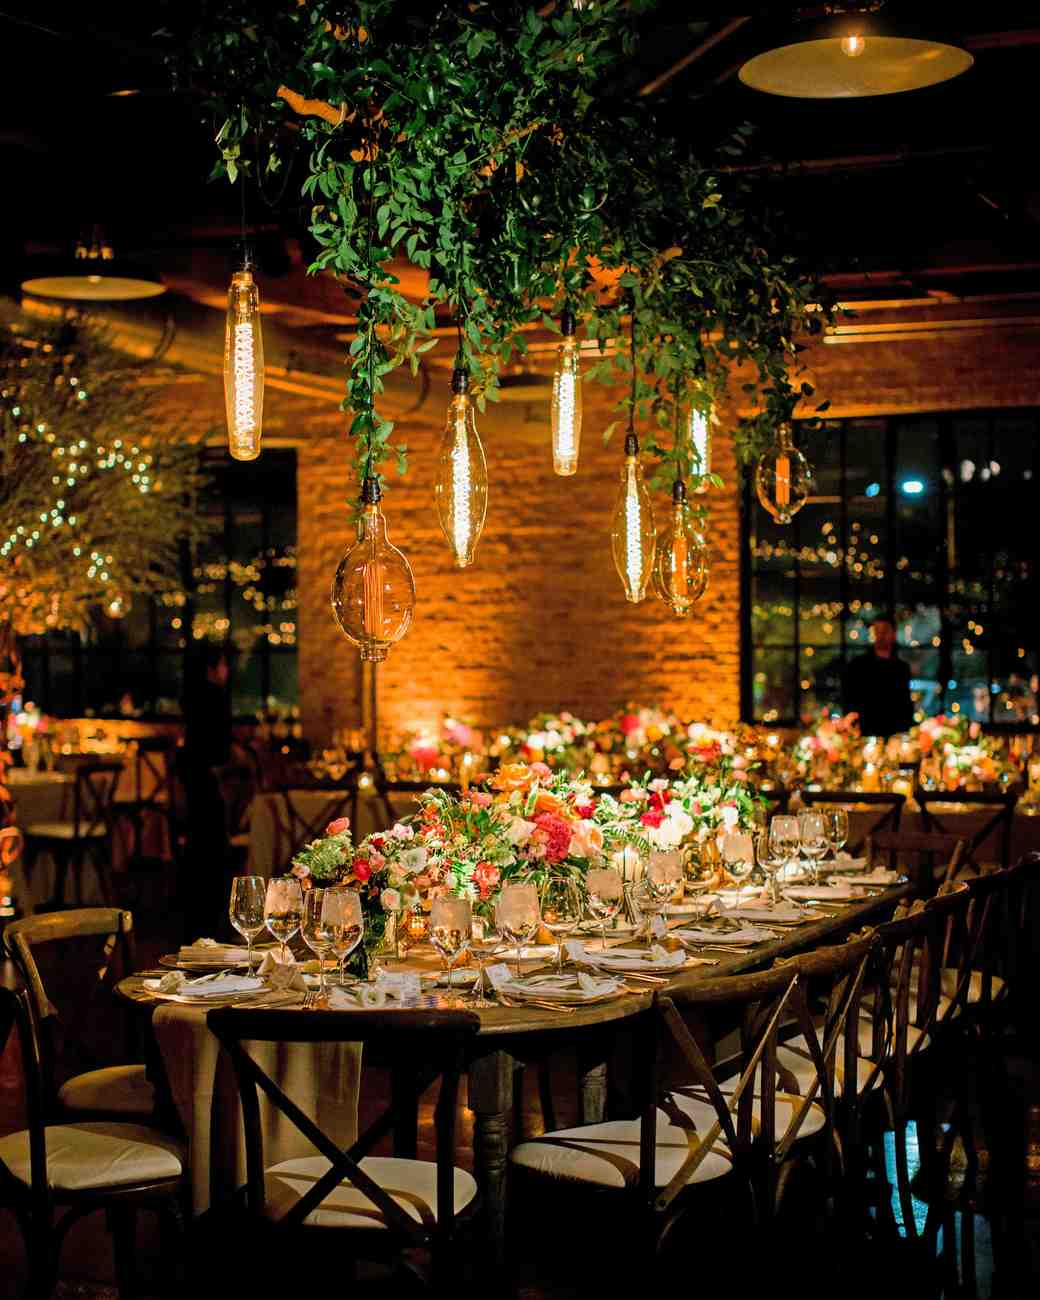 kori paul wedding reception table